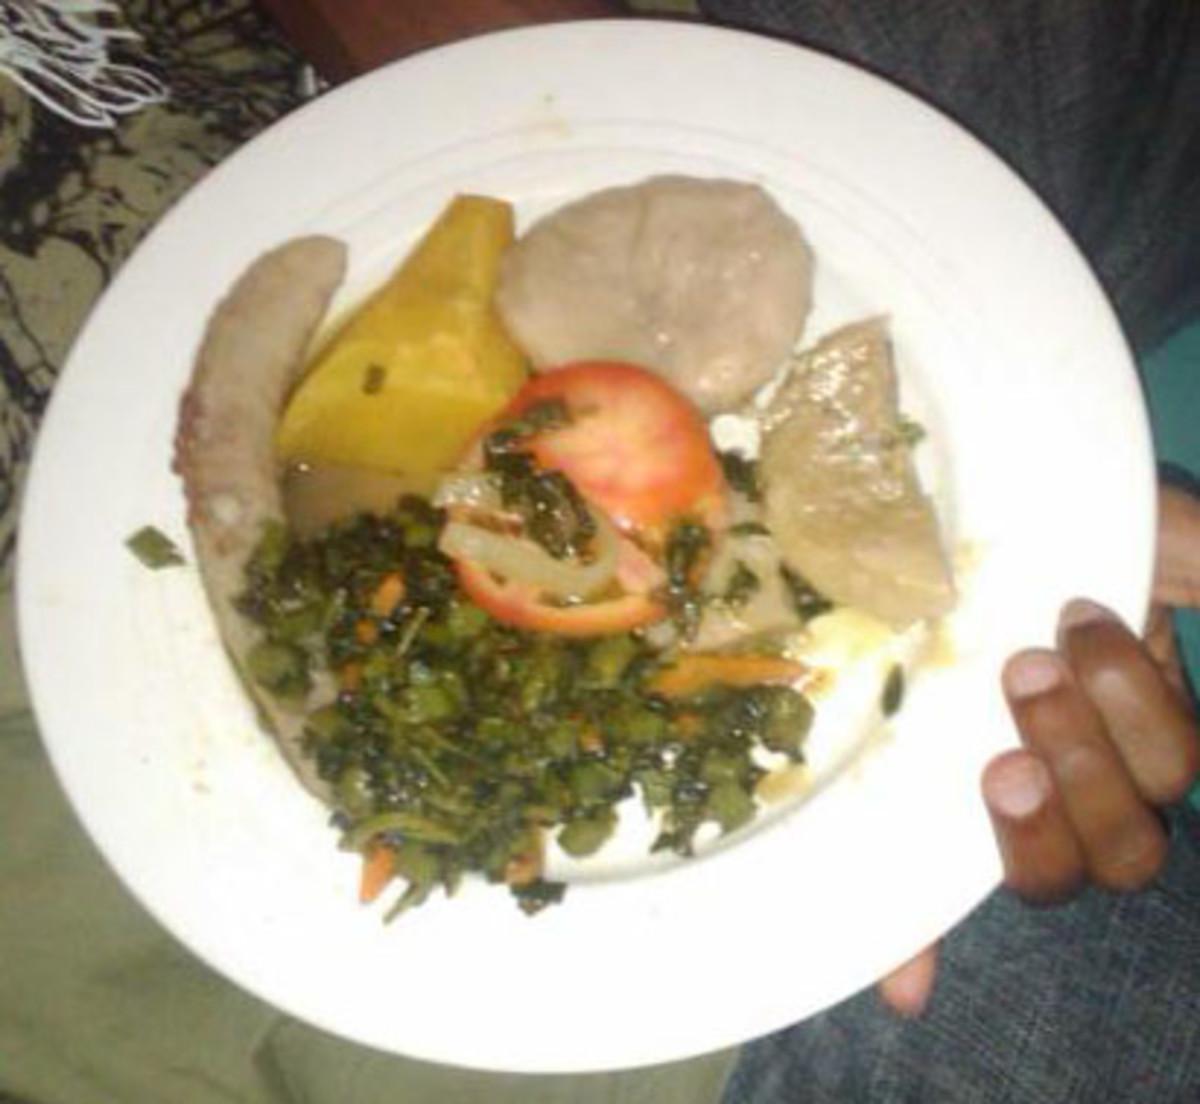 A typical Jamaican-Rastafarian vegetarian food with Boiled Yam, Banana, Dumpling with tomato and callaloo